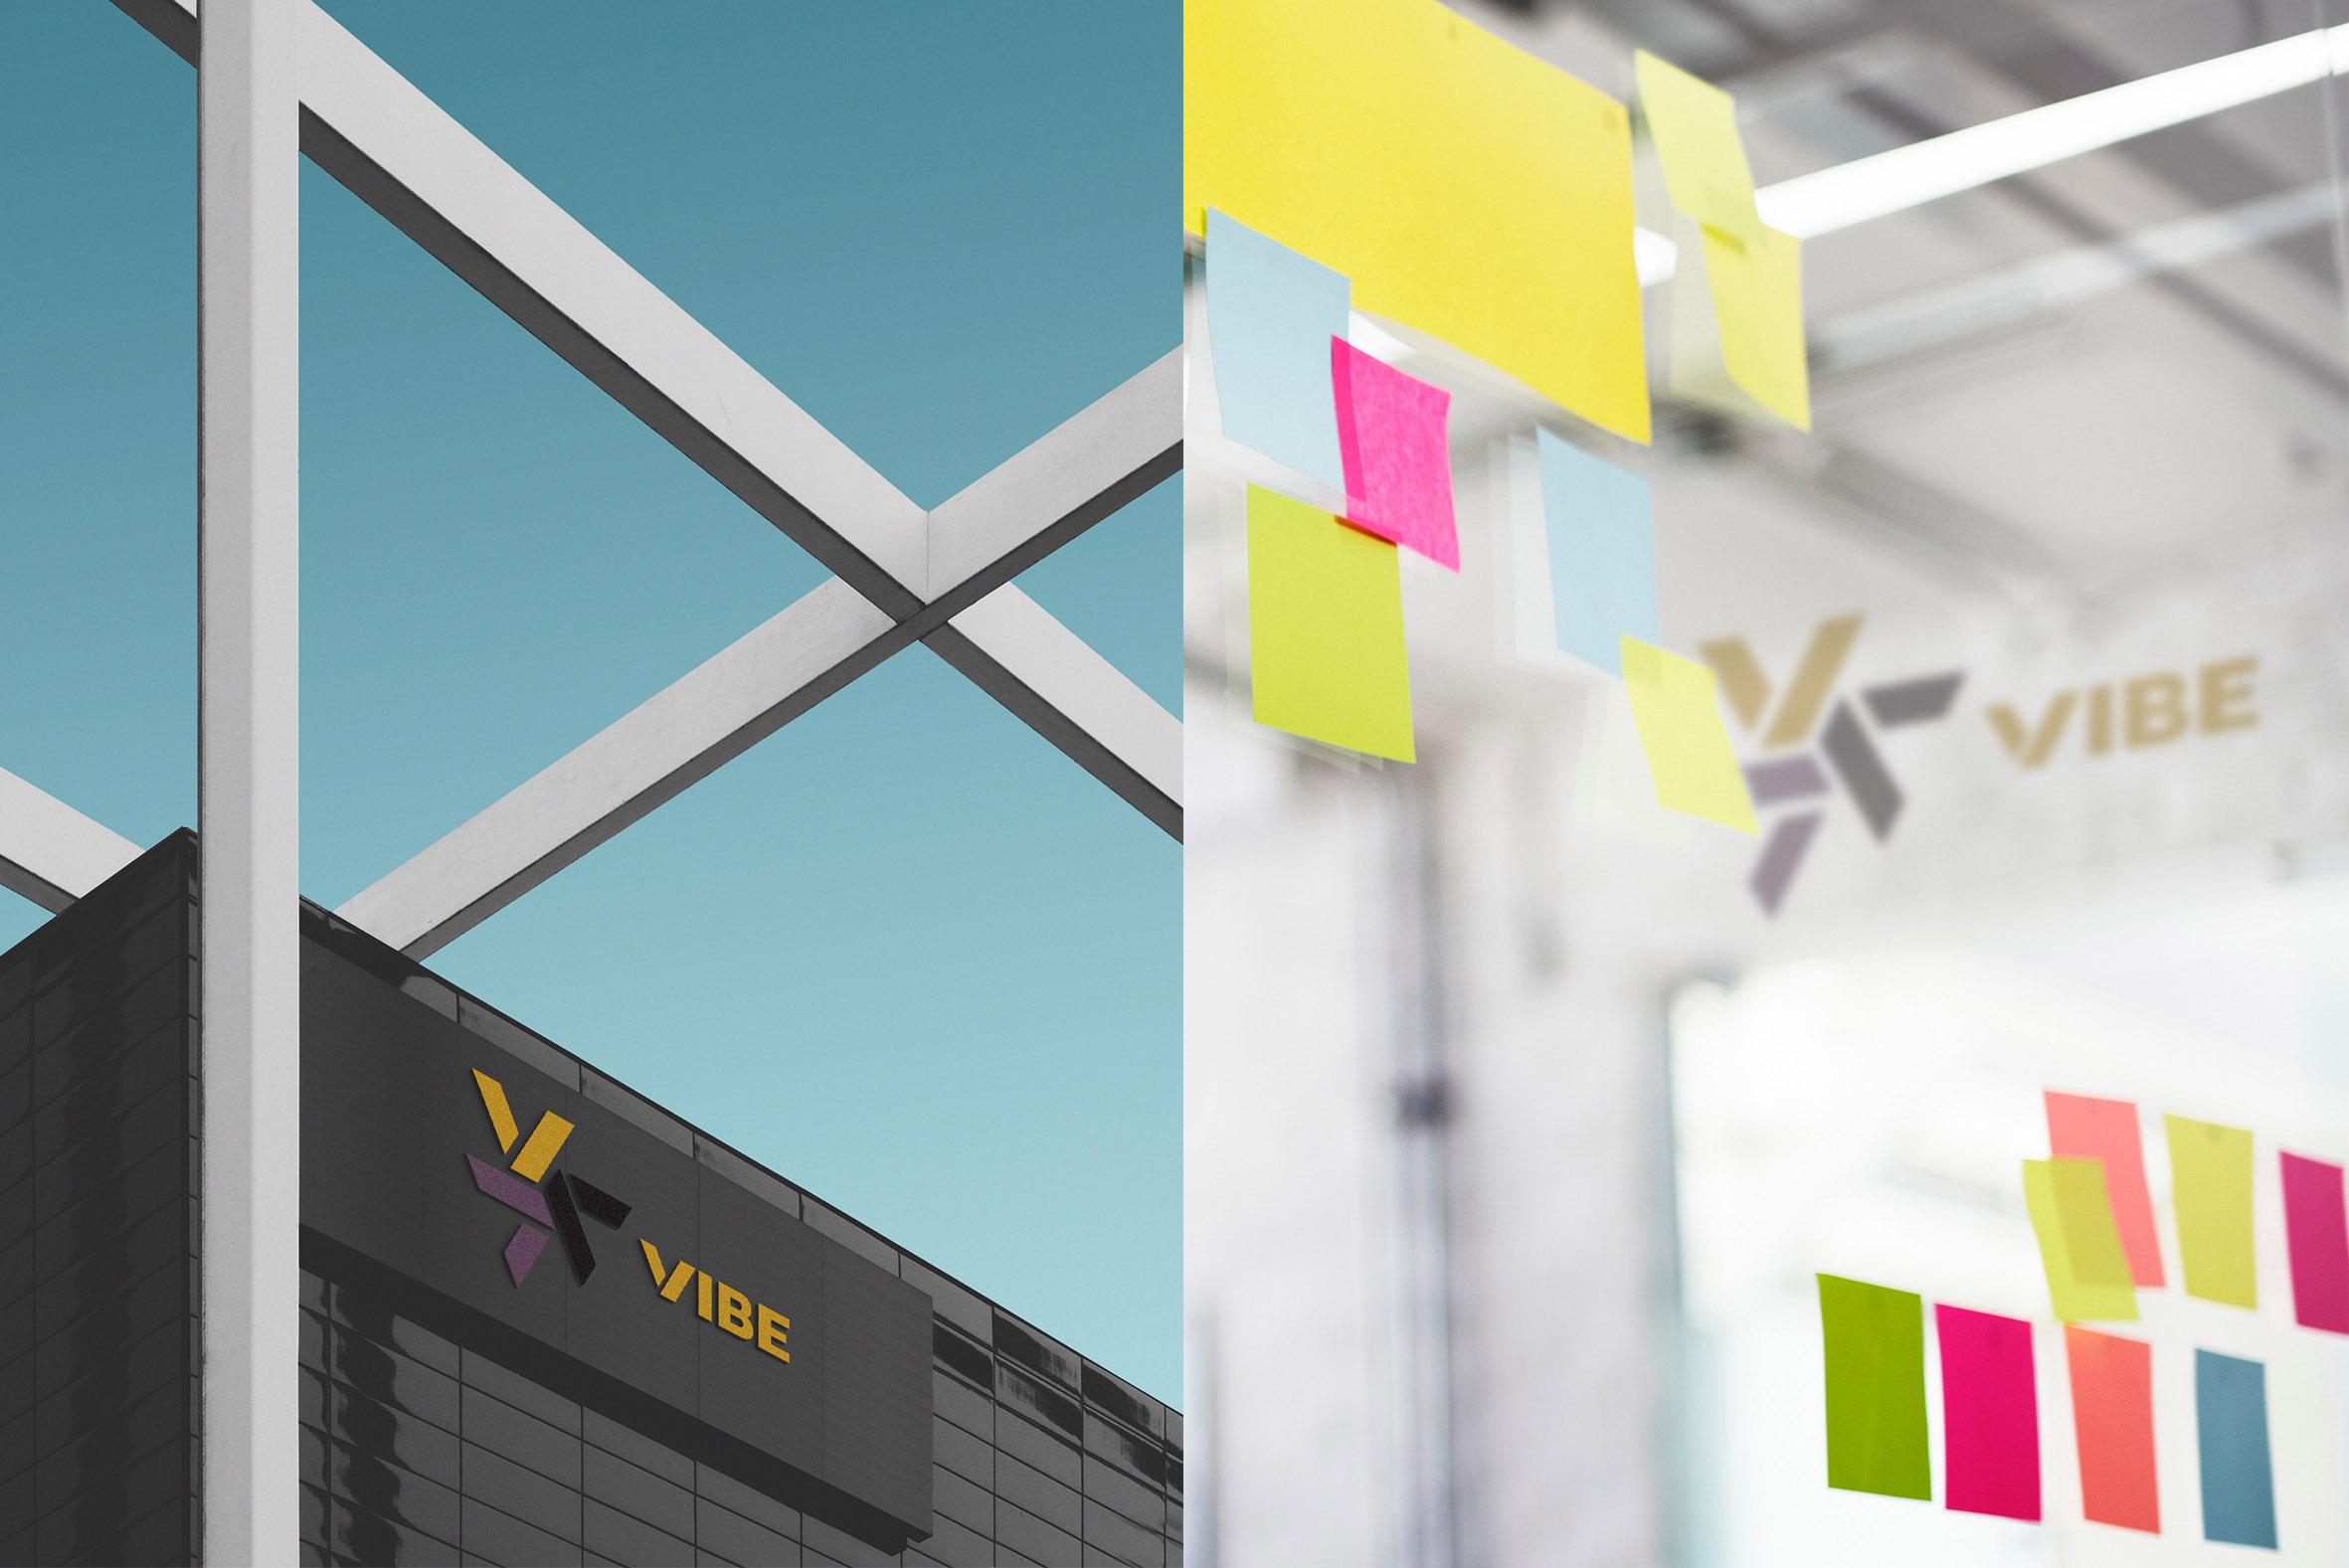 VIBE-building copy.jpg